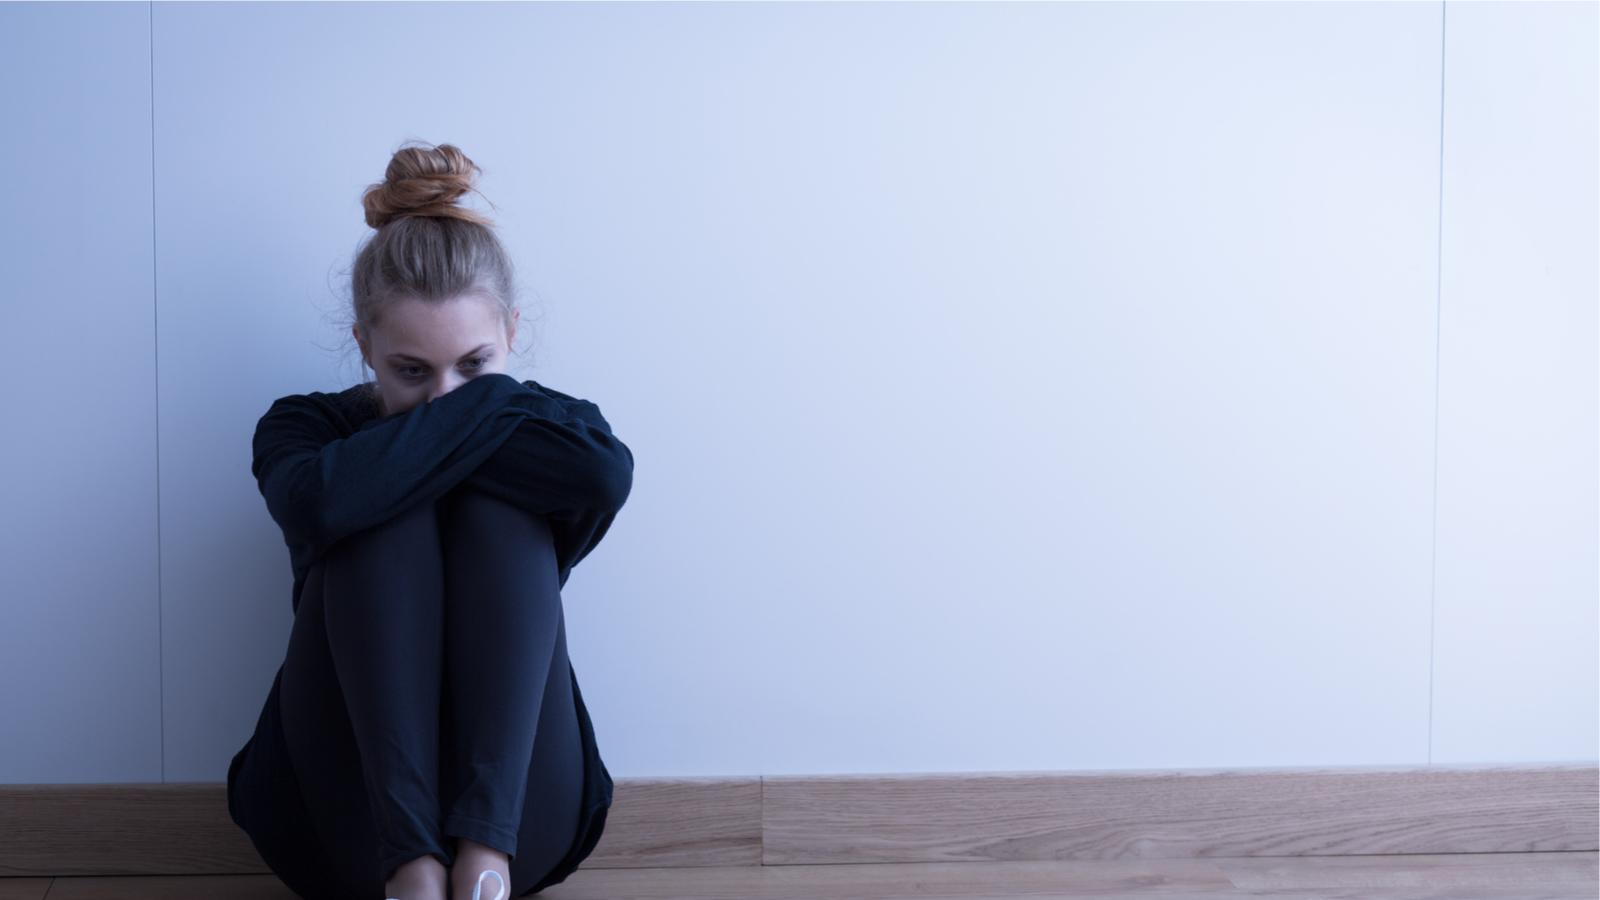 law student shedding mental health stigma